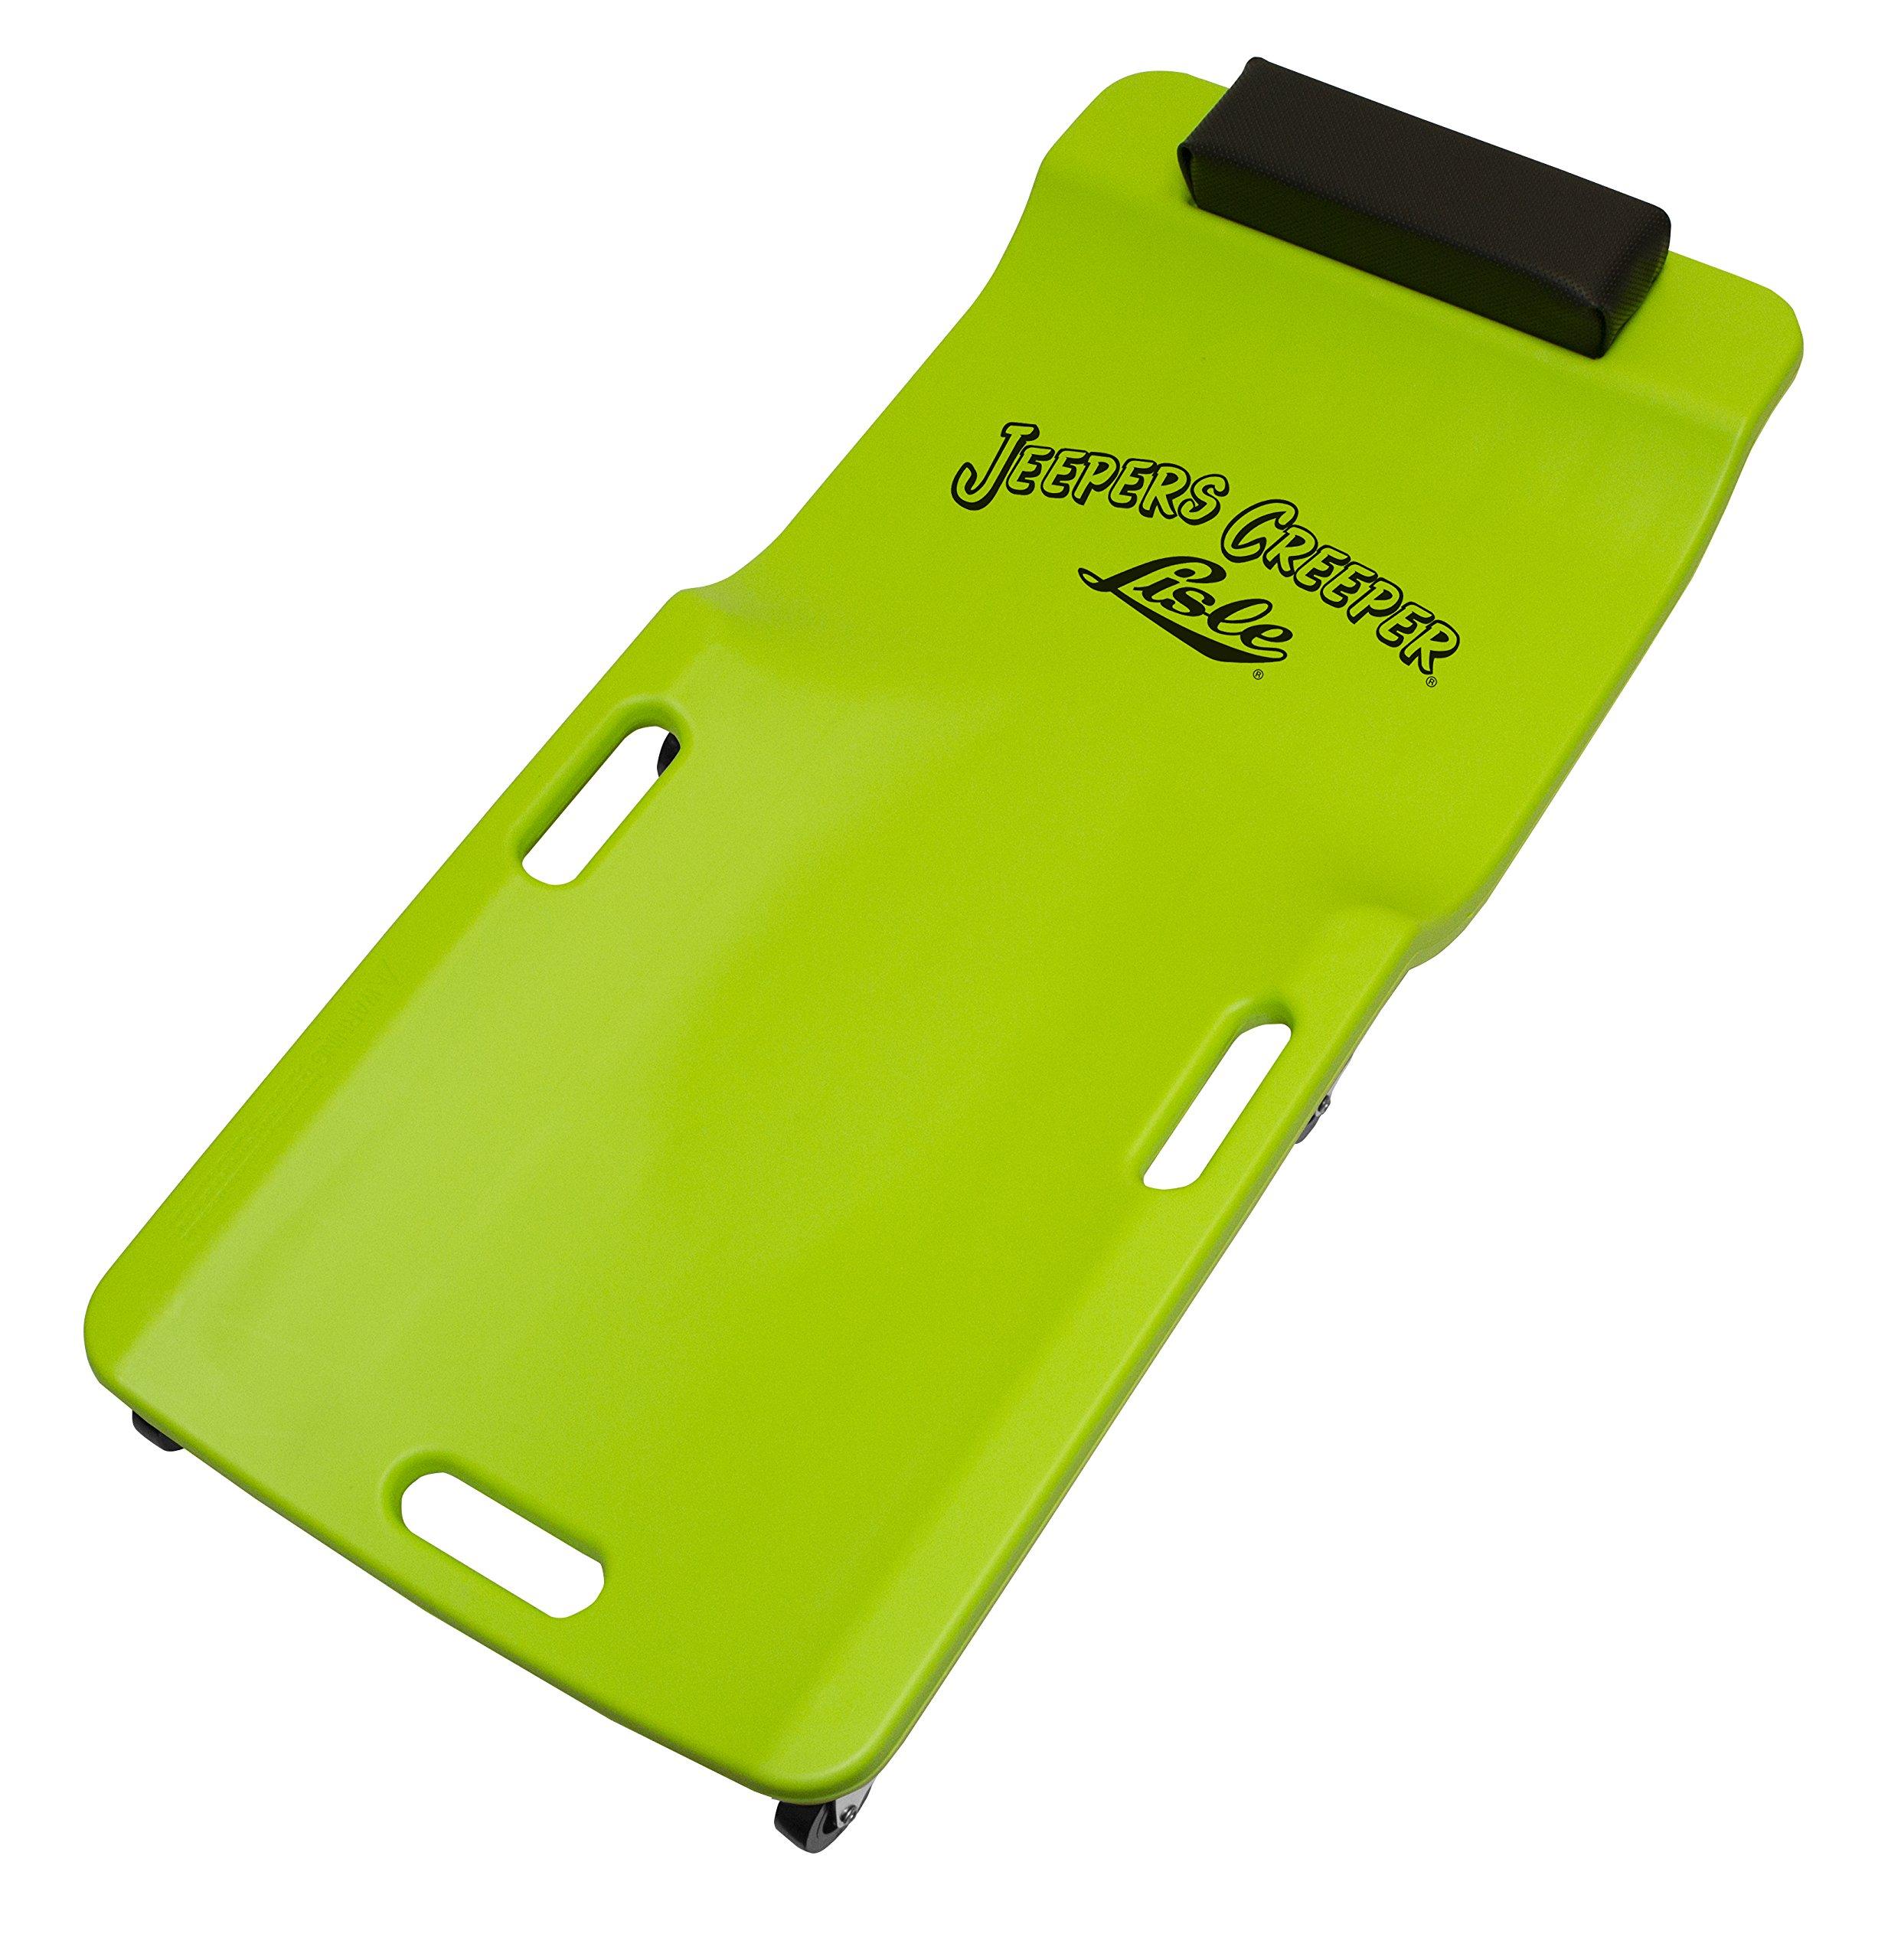 Lisle 99102 Green Neon Low Profile Plastic Creeper by Lisle